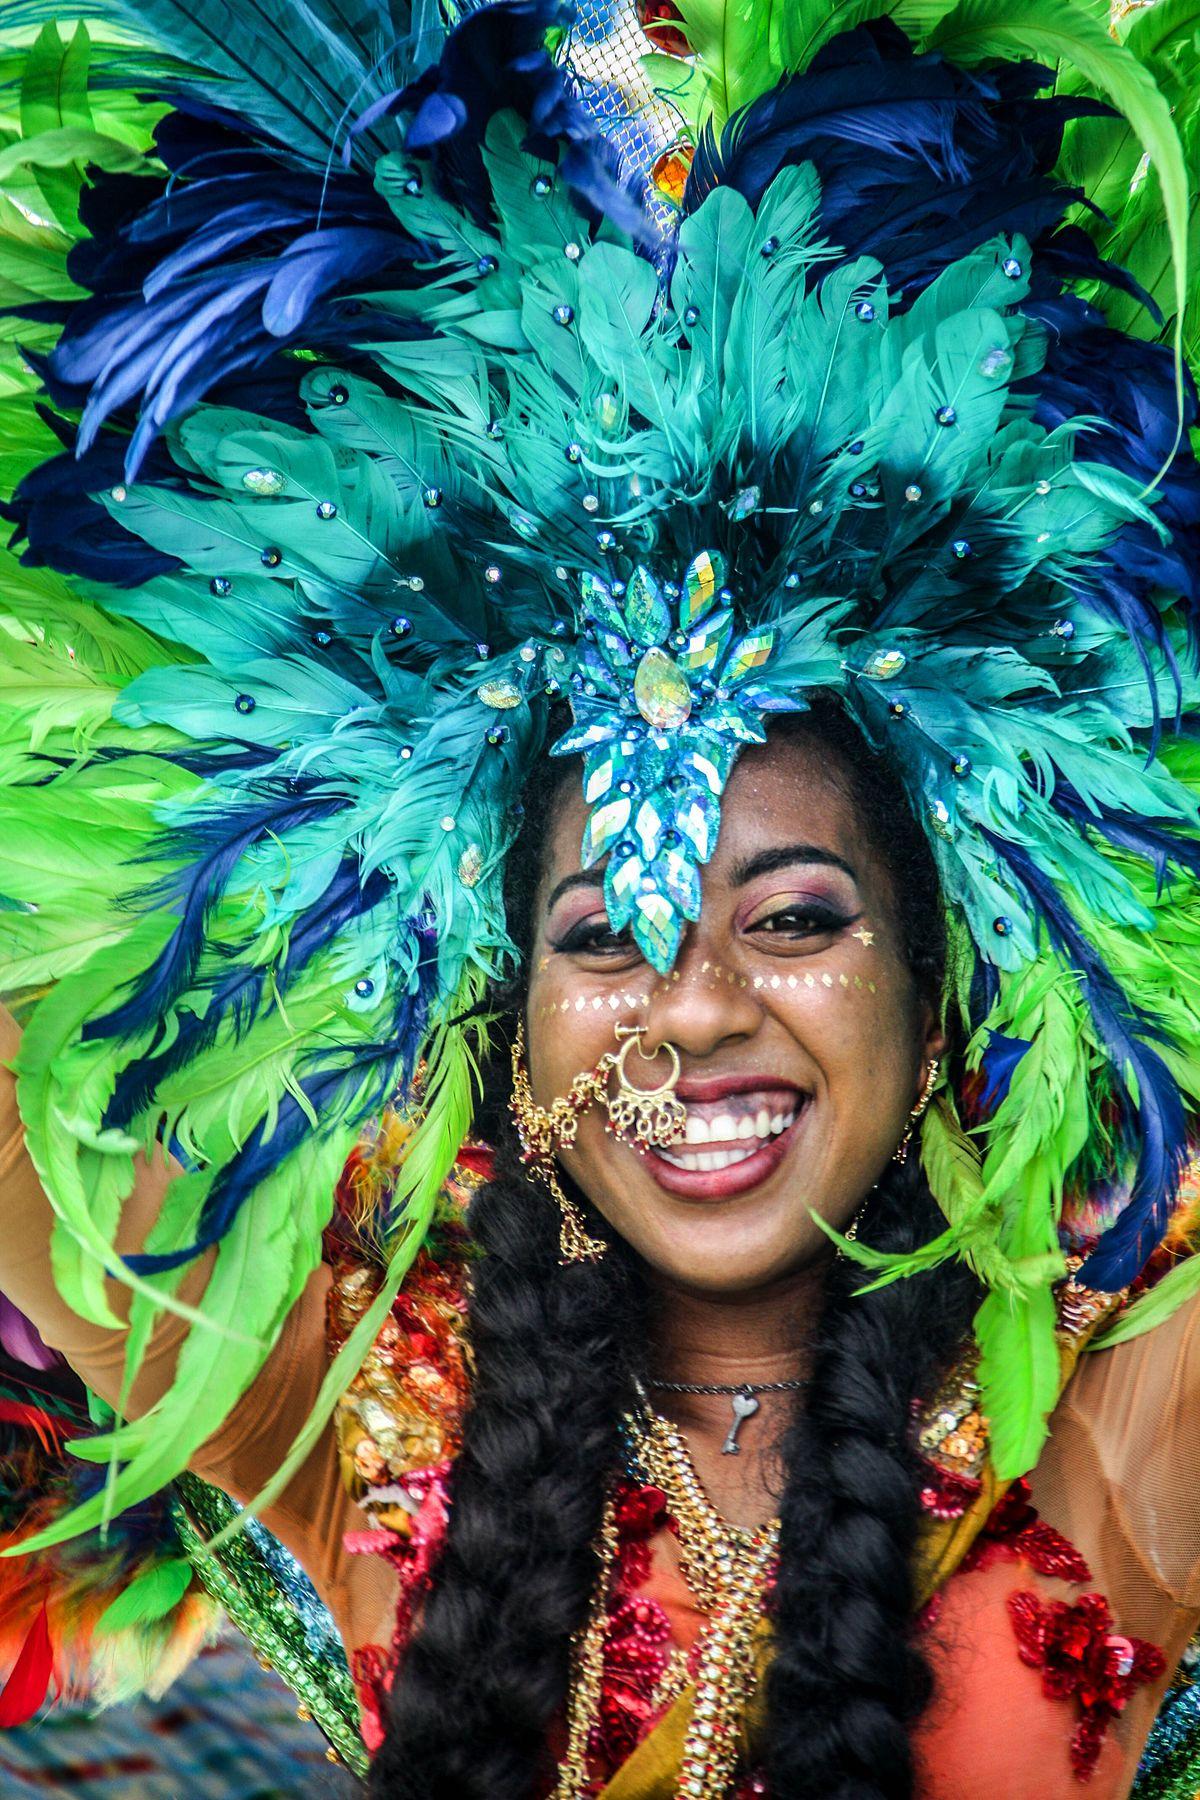 Rio Carnaval Orgy Party  Free Porn Sex Videos  Redtube